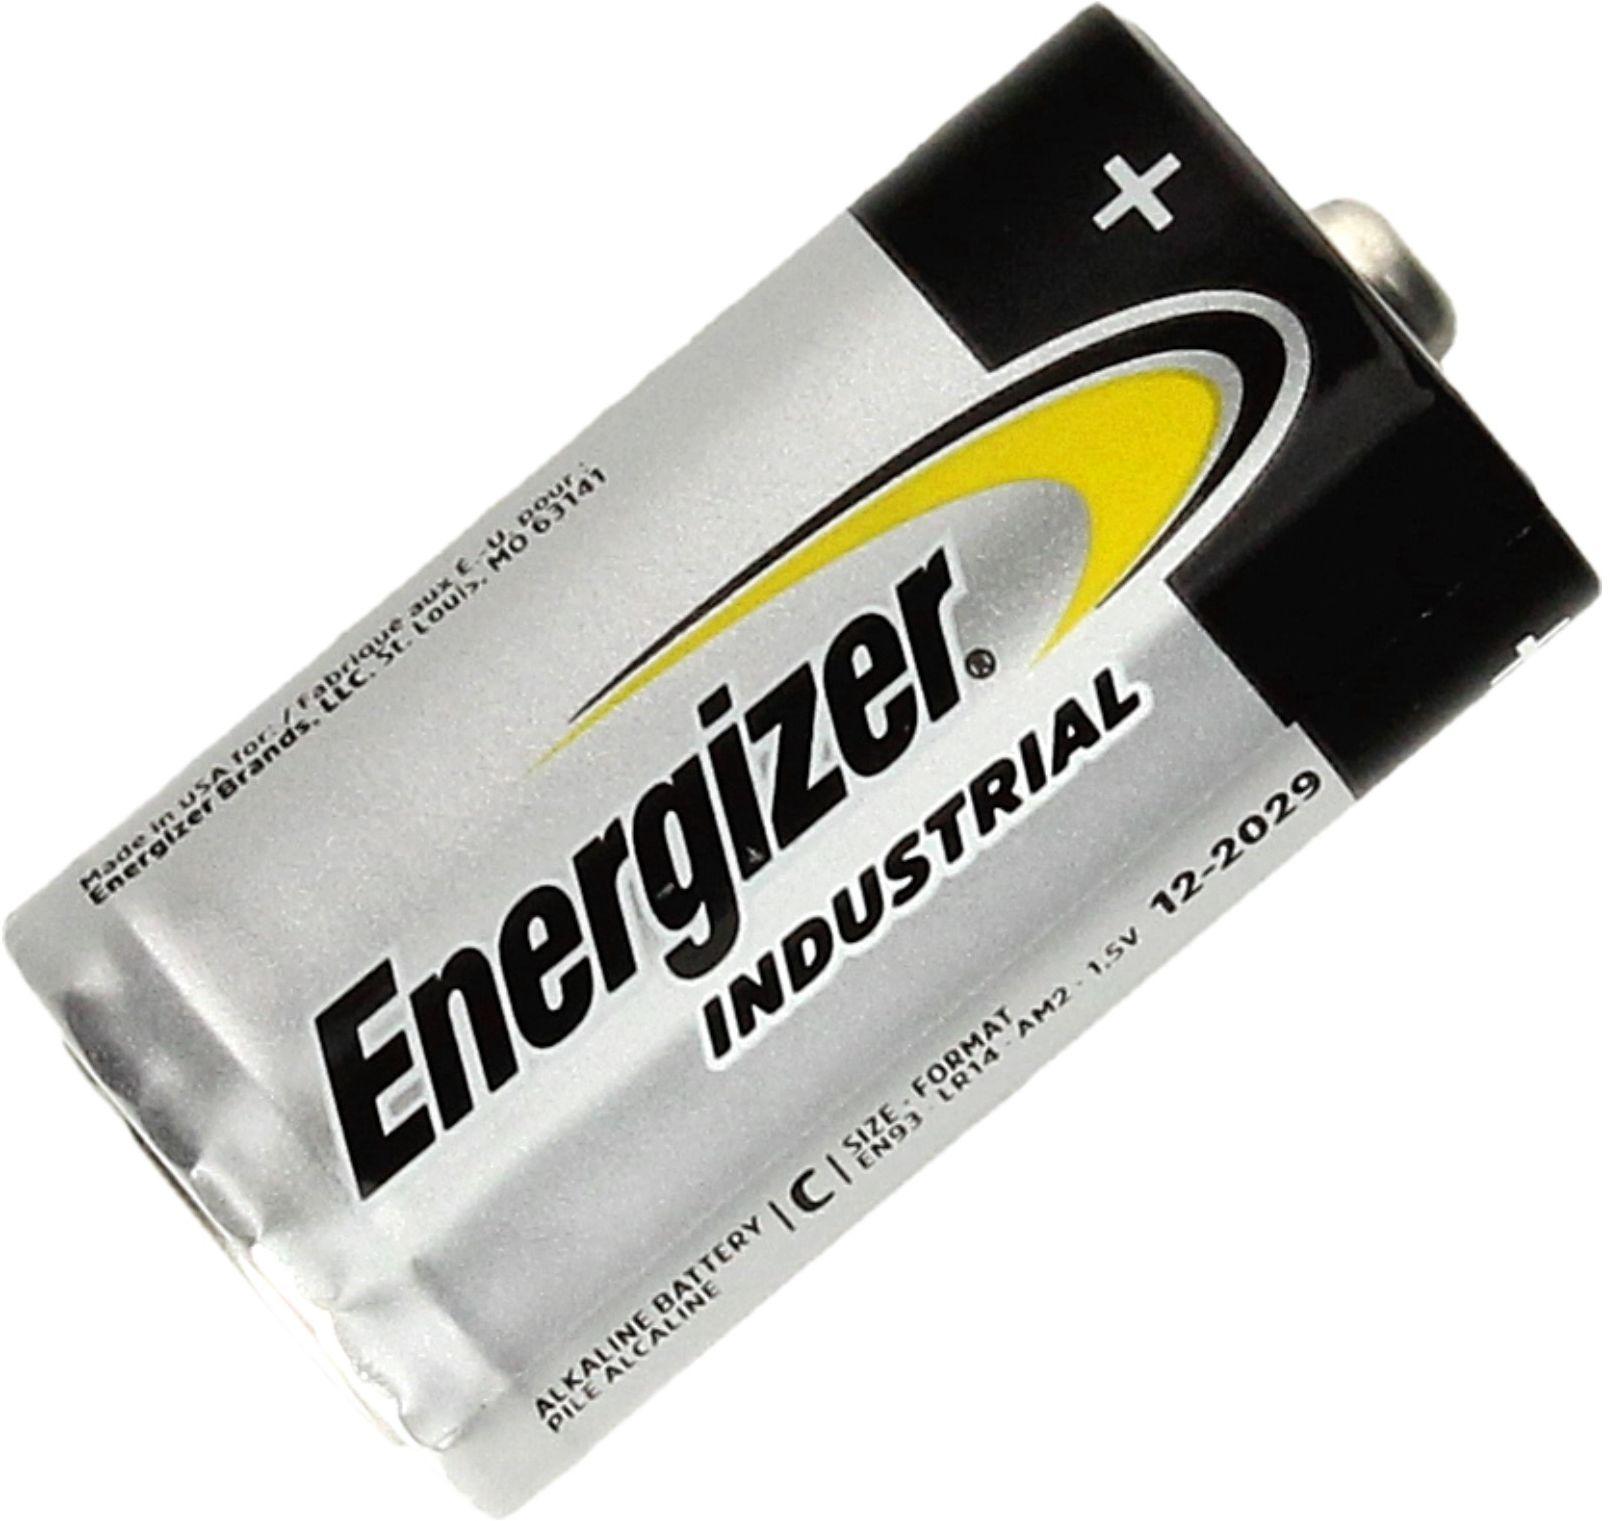 Bateria alkaliczna LR14 Industrial Energizer